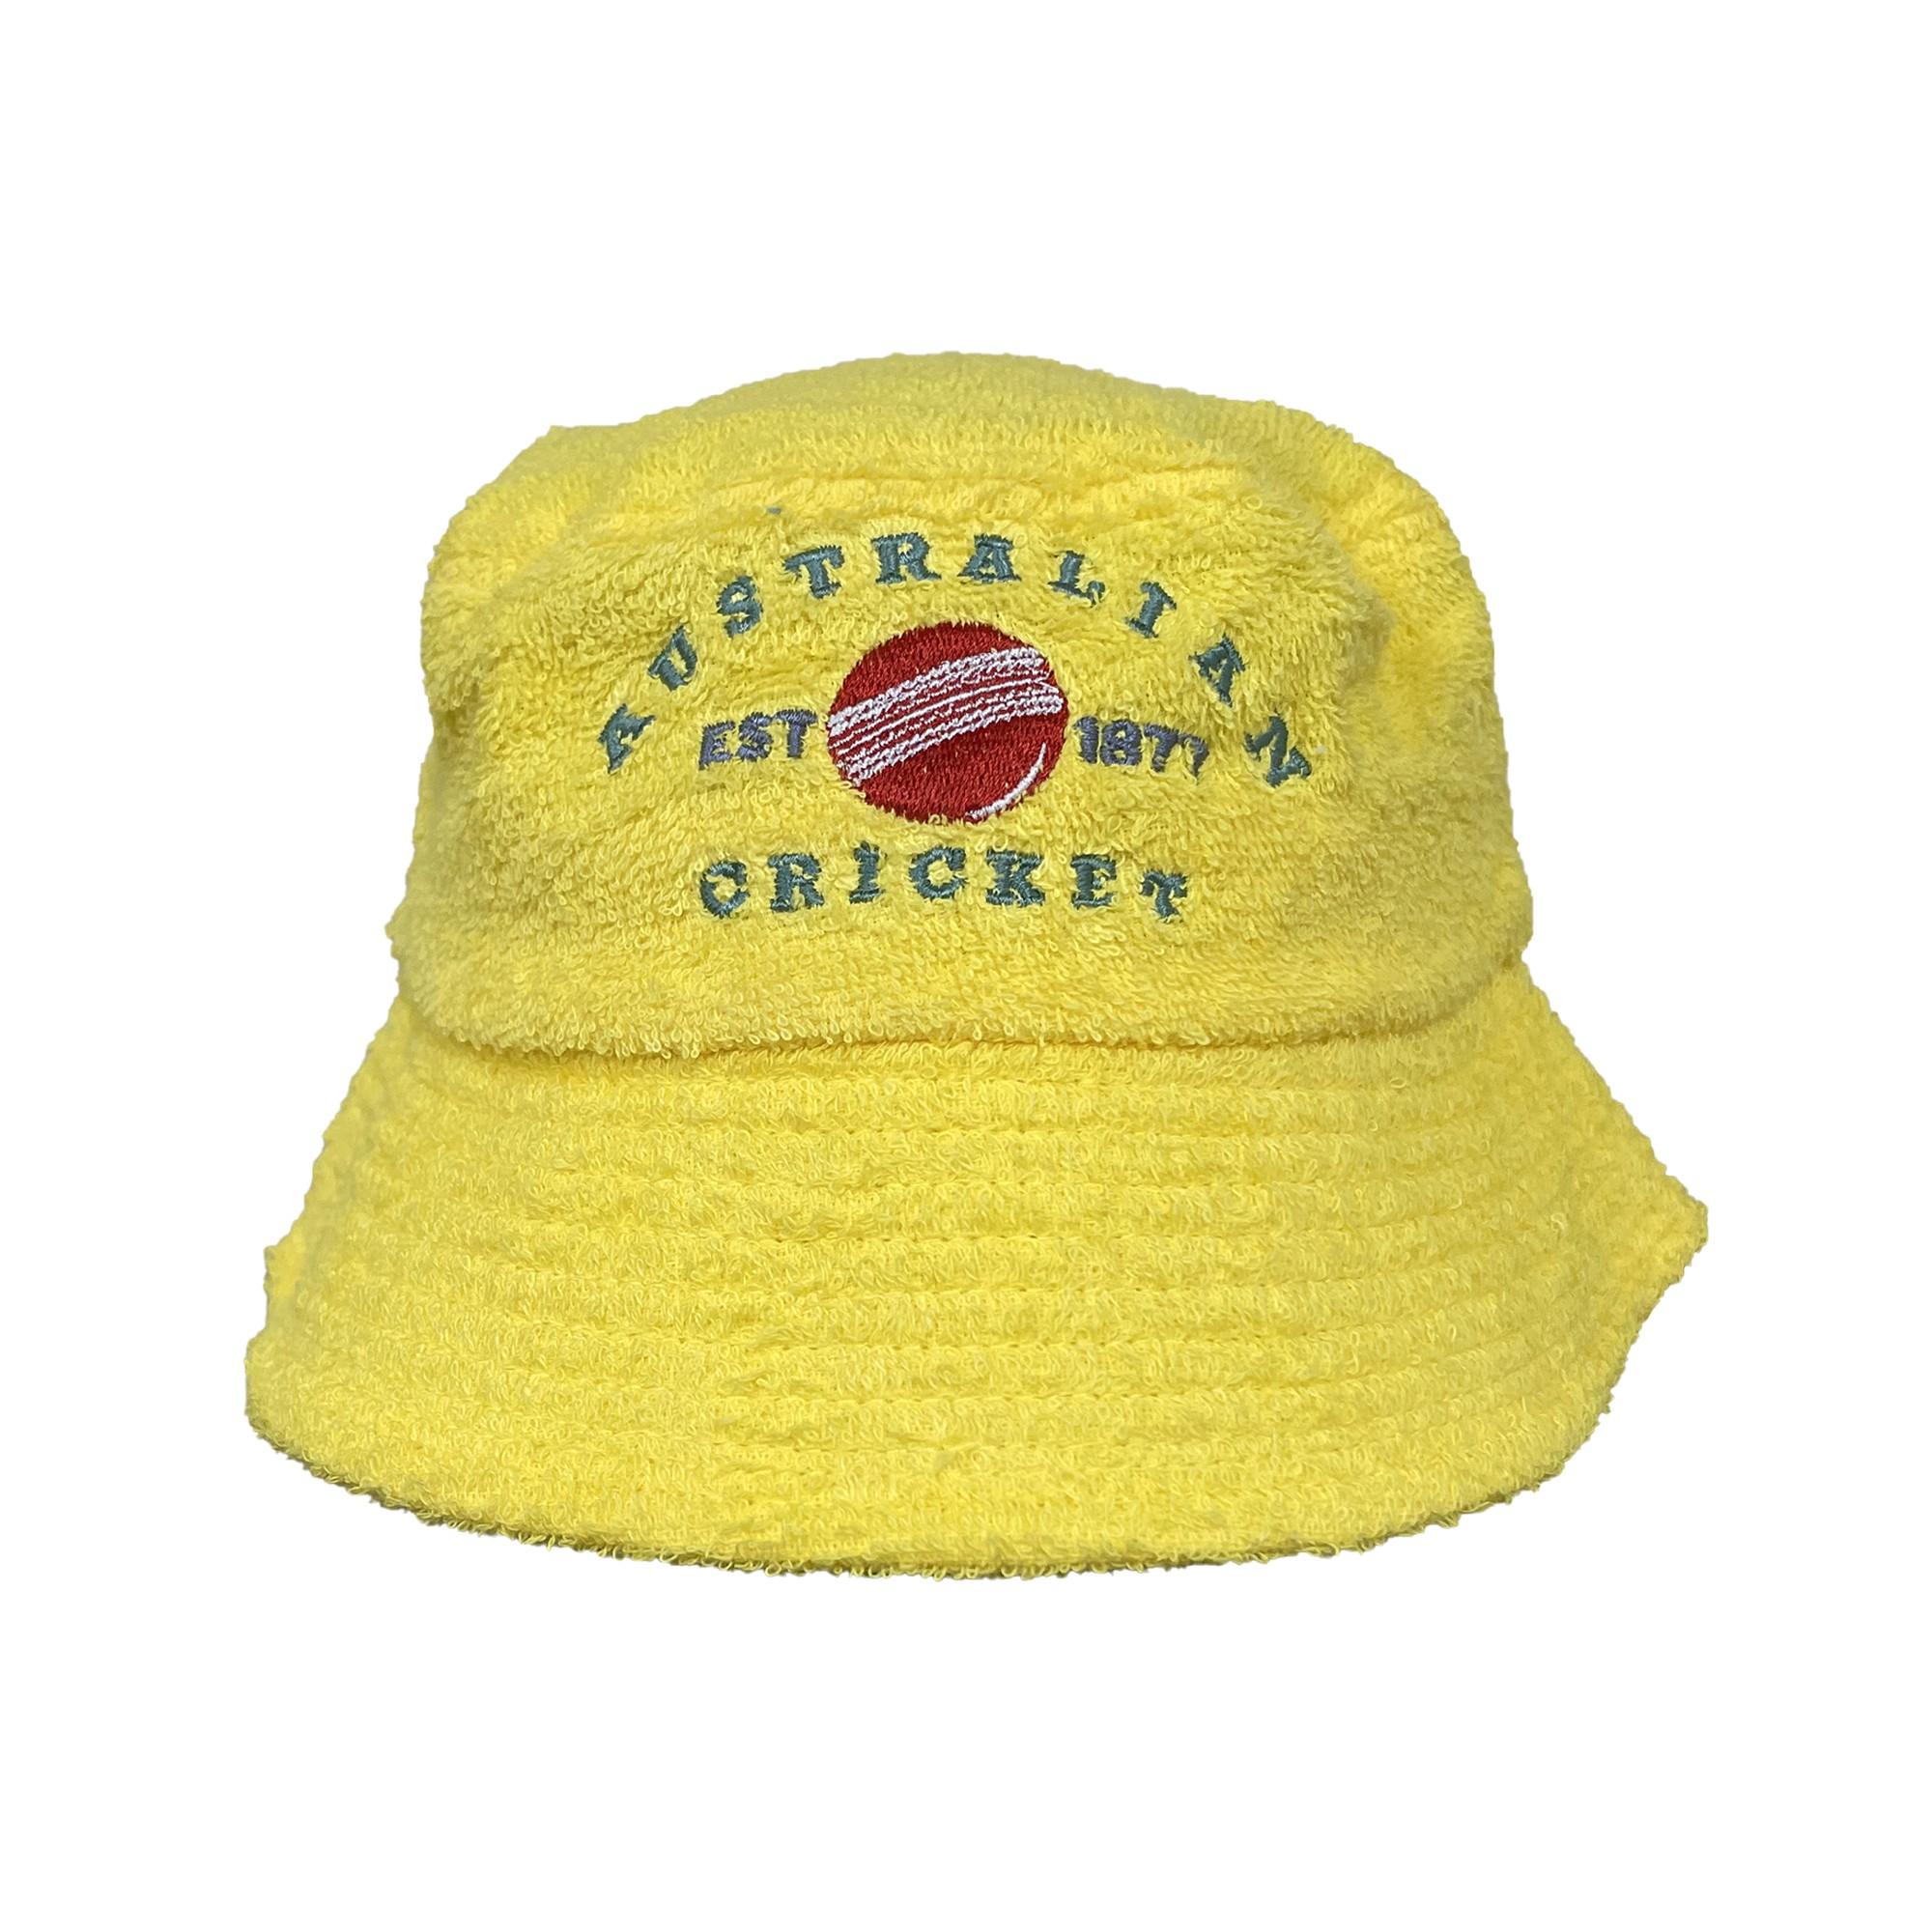 VINTAGE AUSTRALIAN CRICKET YELLOW TERRY TOWEL BUCKET HAT